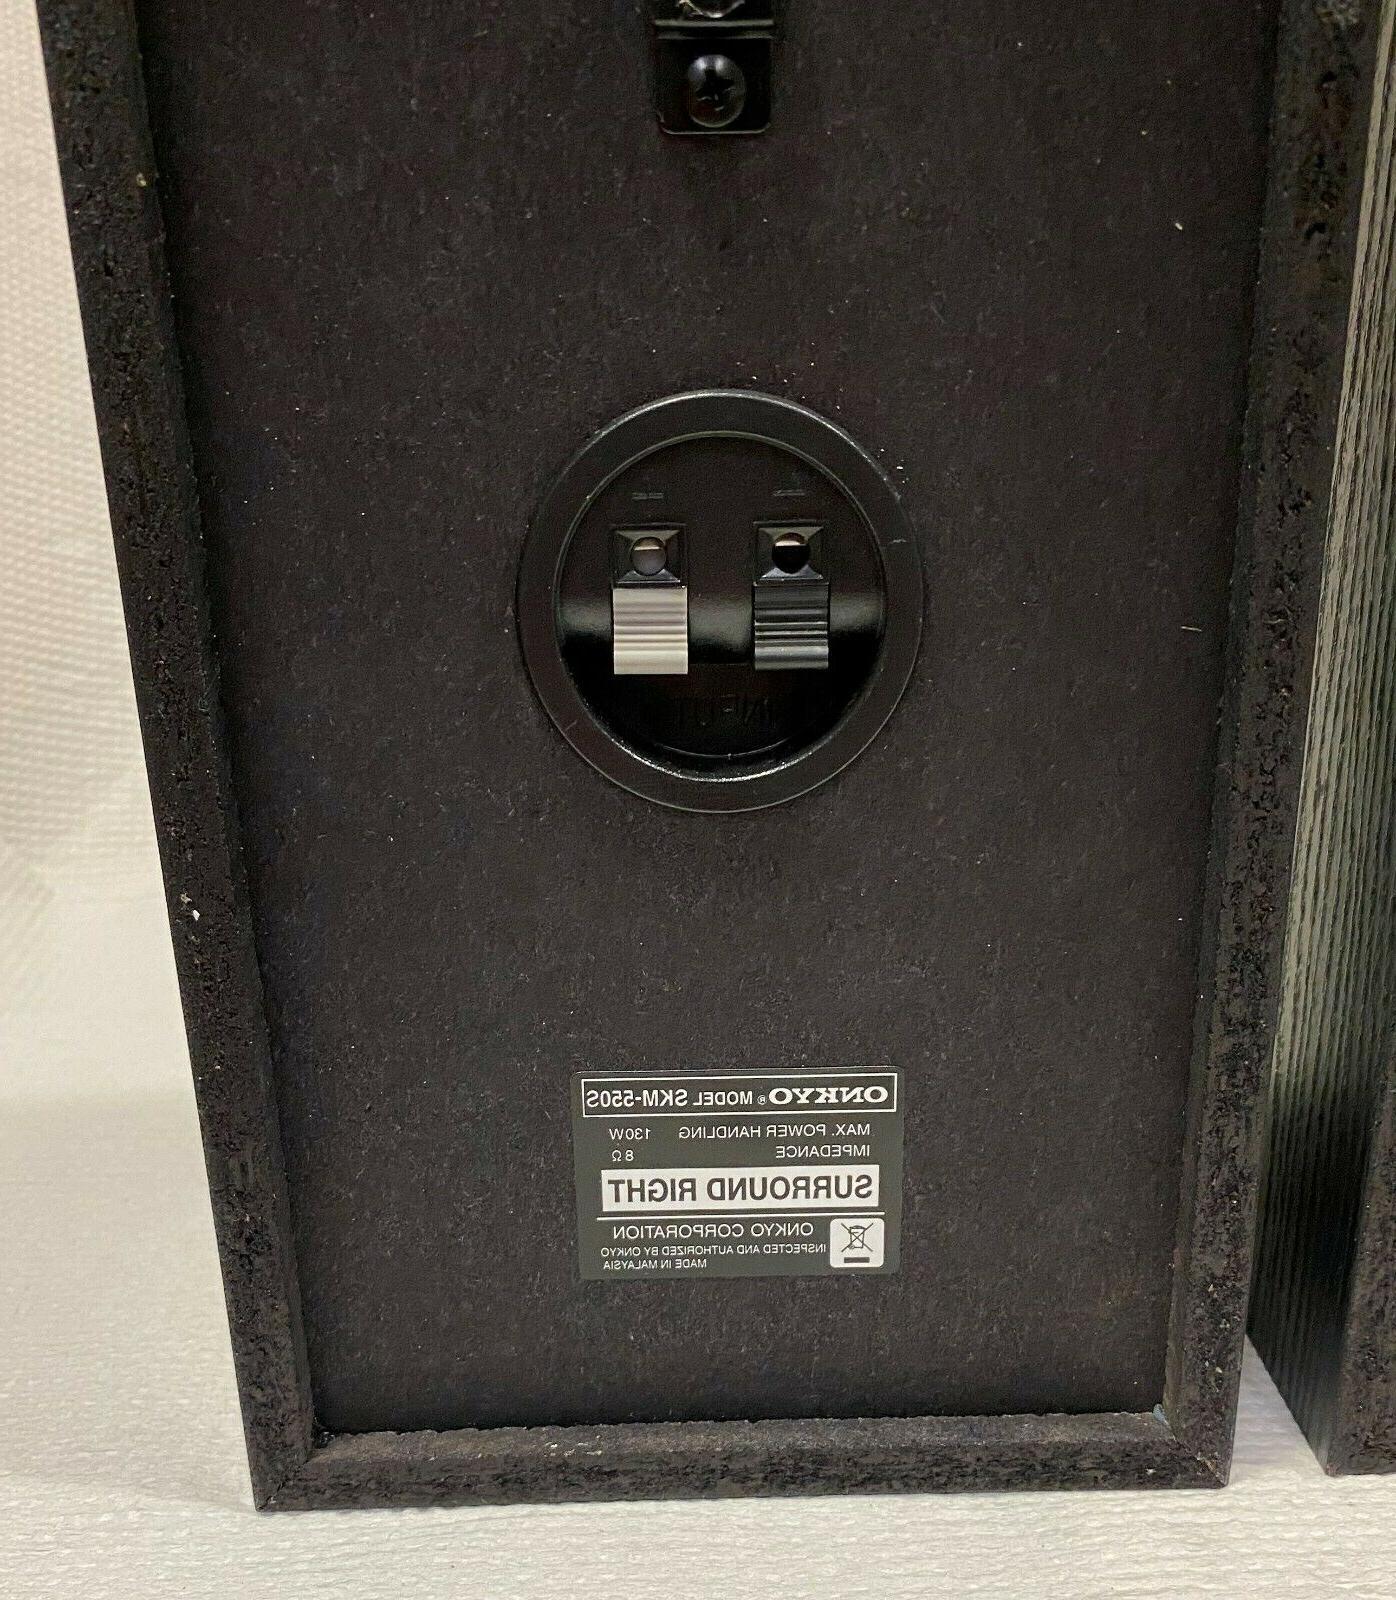 Surround Speakers L&R, SKB-550 BRAND NEW